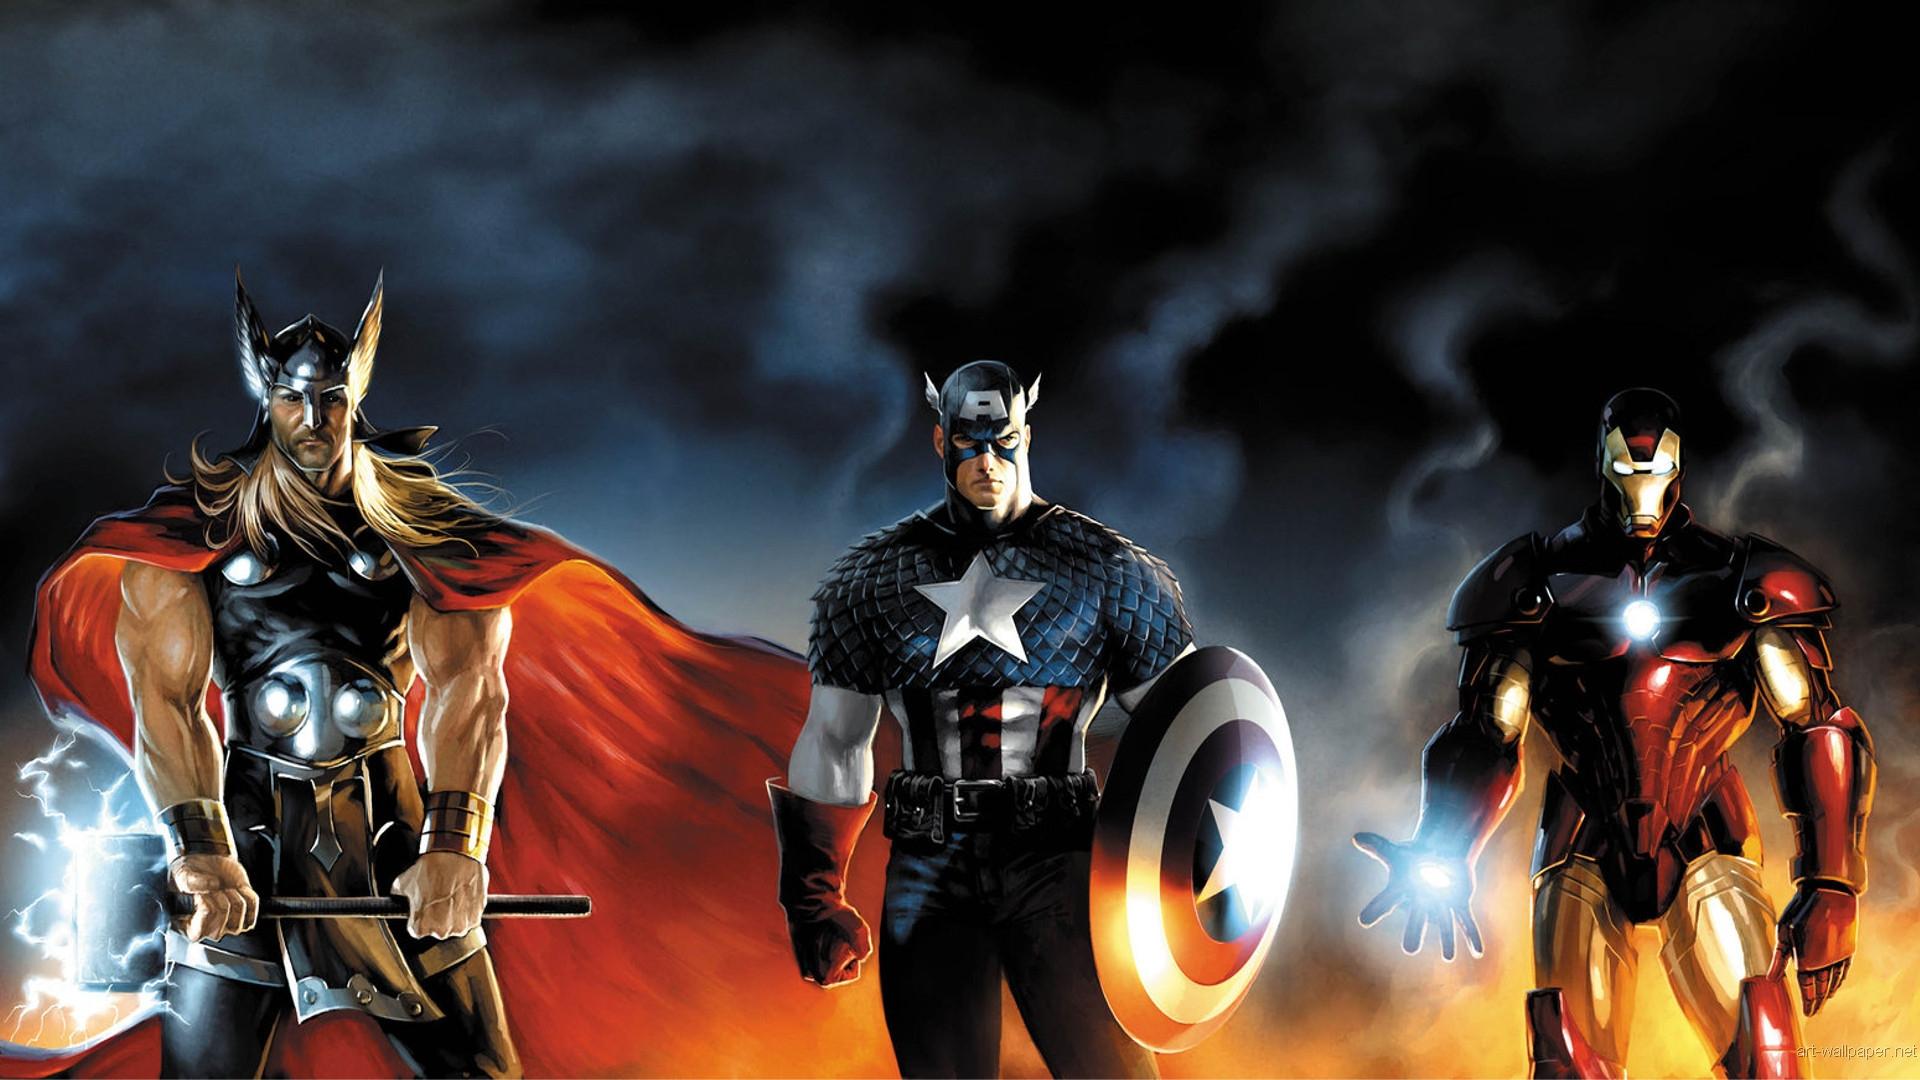 Free Thor Wallpaper HD for Desktop (2)